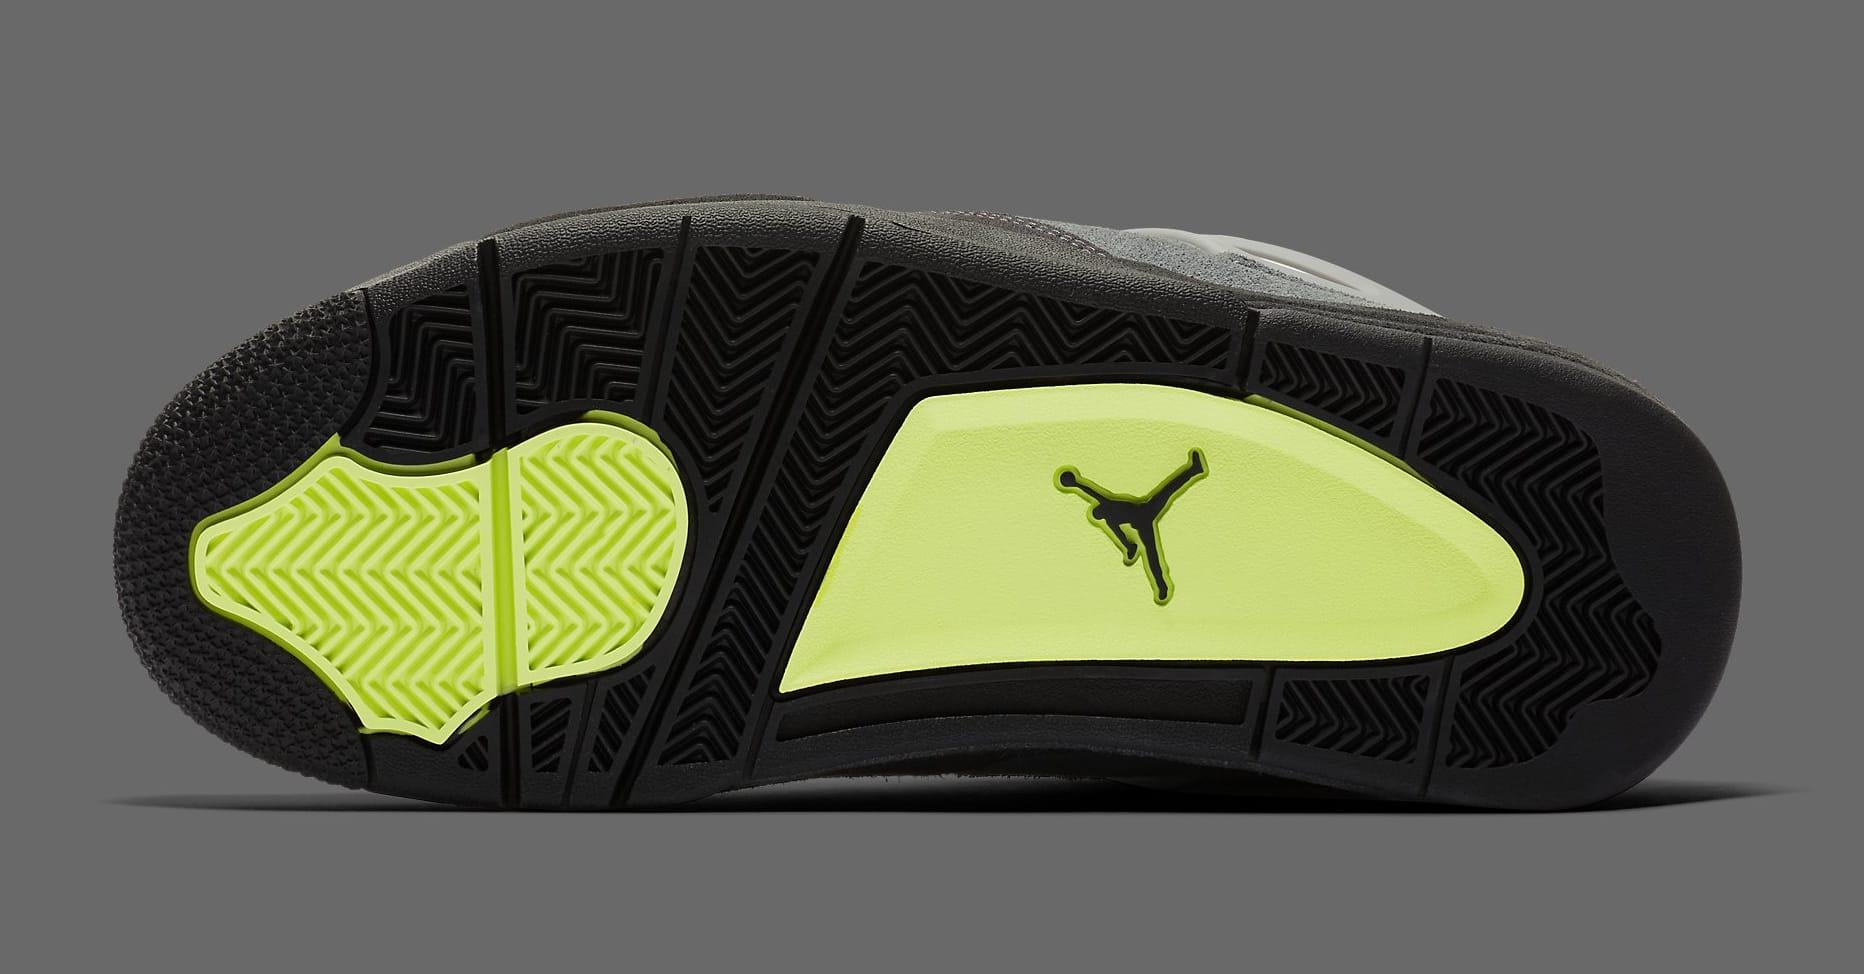 Air Jordan 4 Retro 'Neon' CT5342-007 Outsole